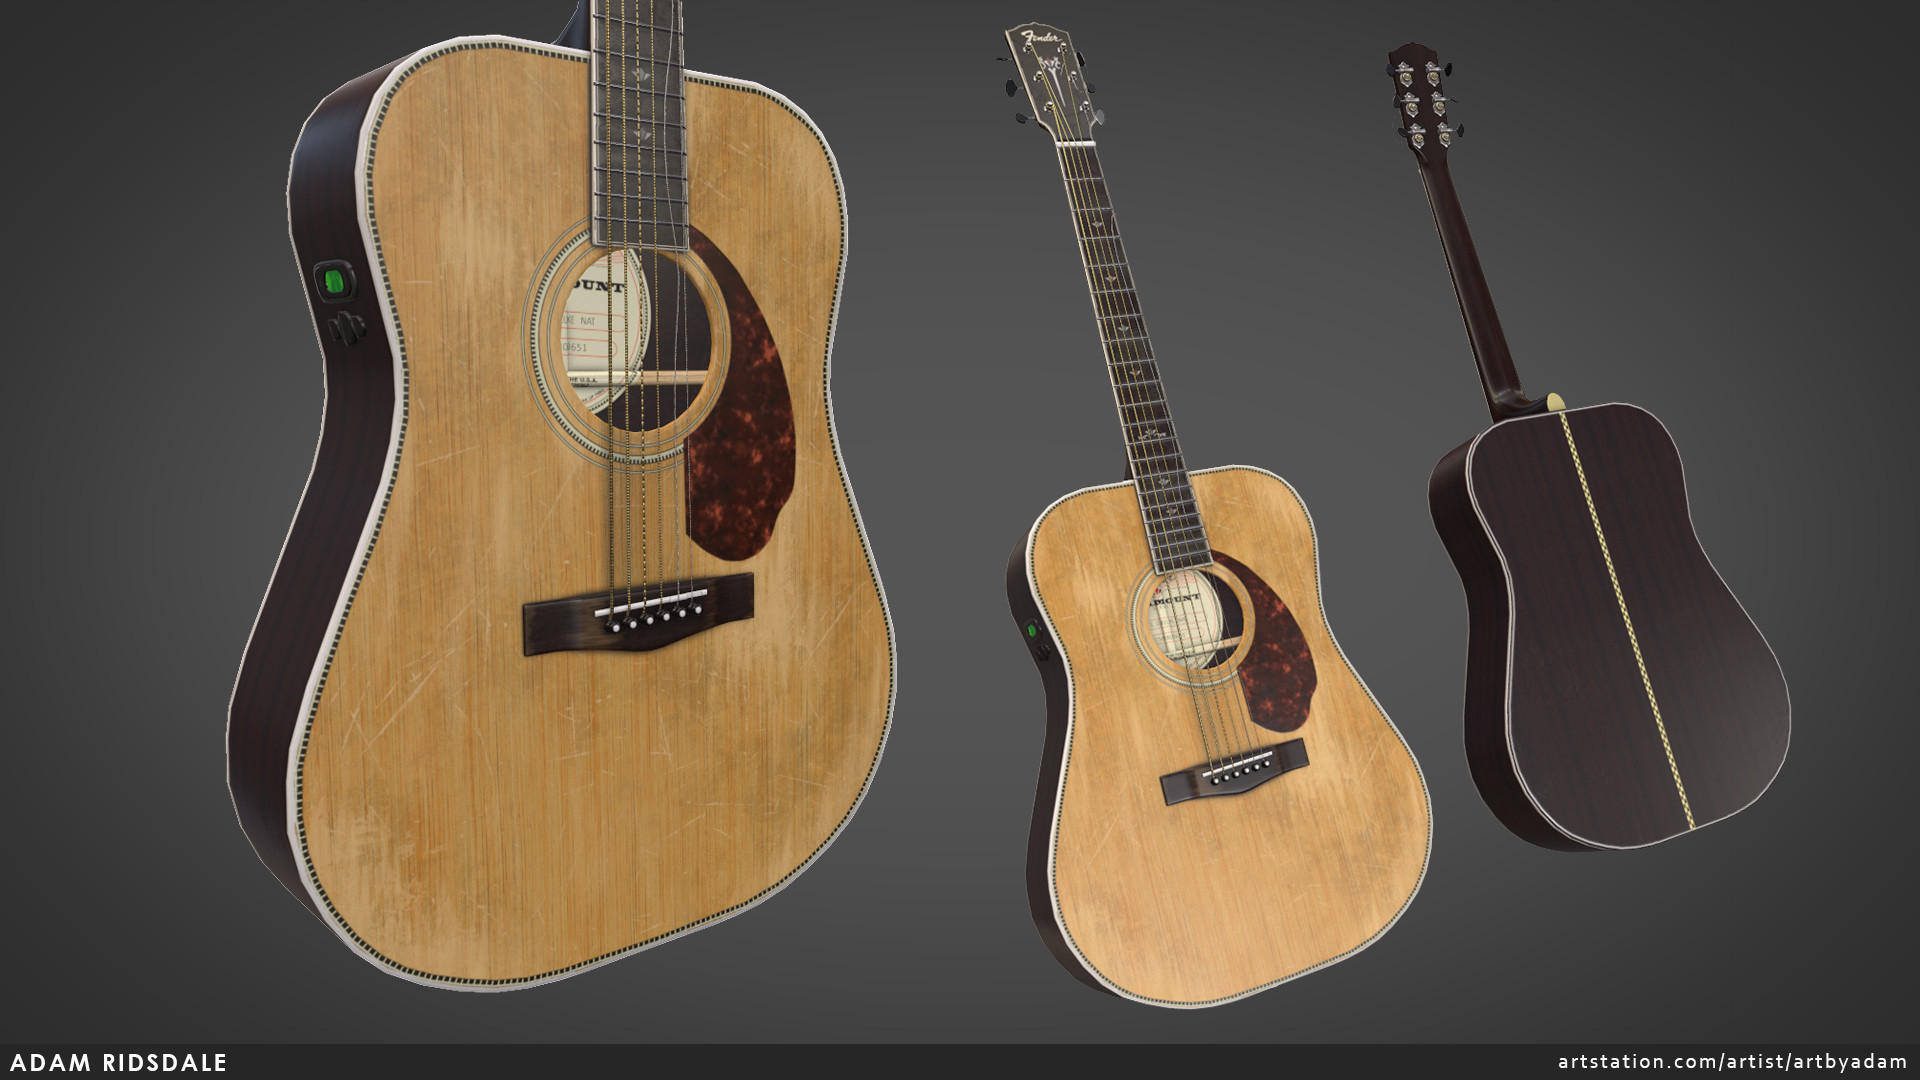 Adam ridsdale guitar01